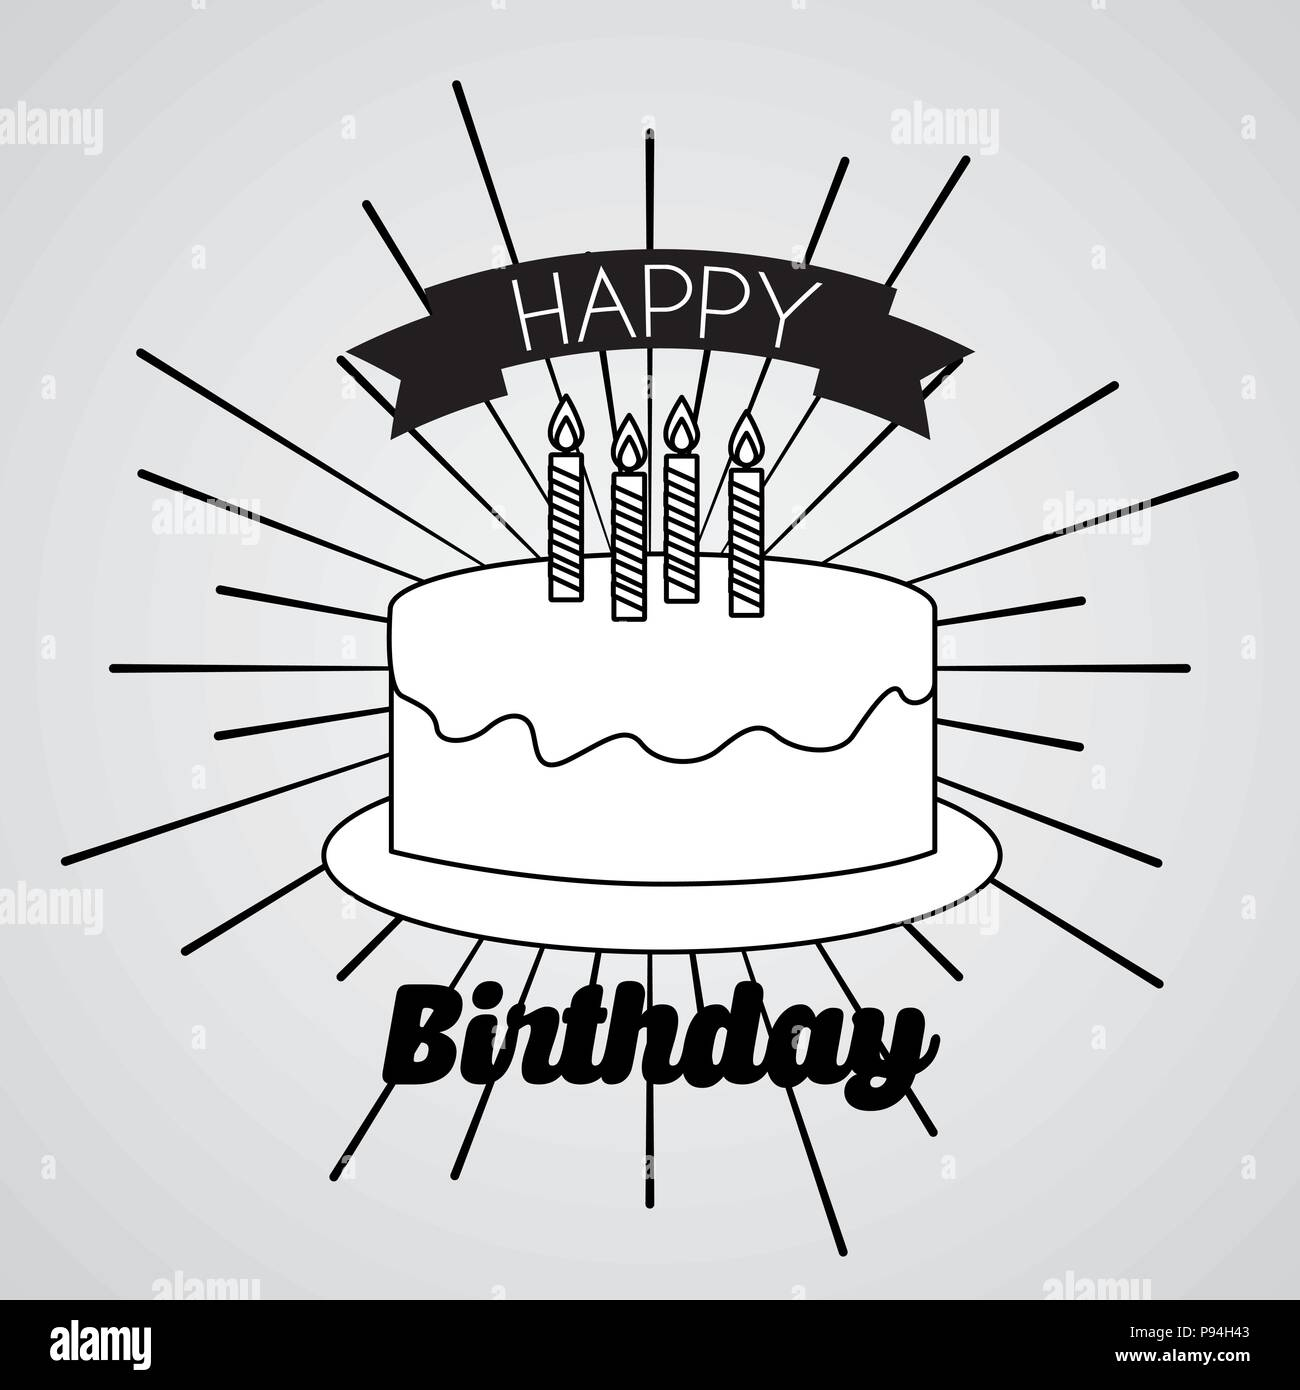 Happy Birthday Card Draw Kuchen Candless Ribbon Vector Illustration